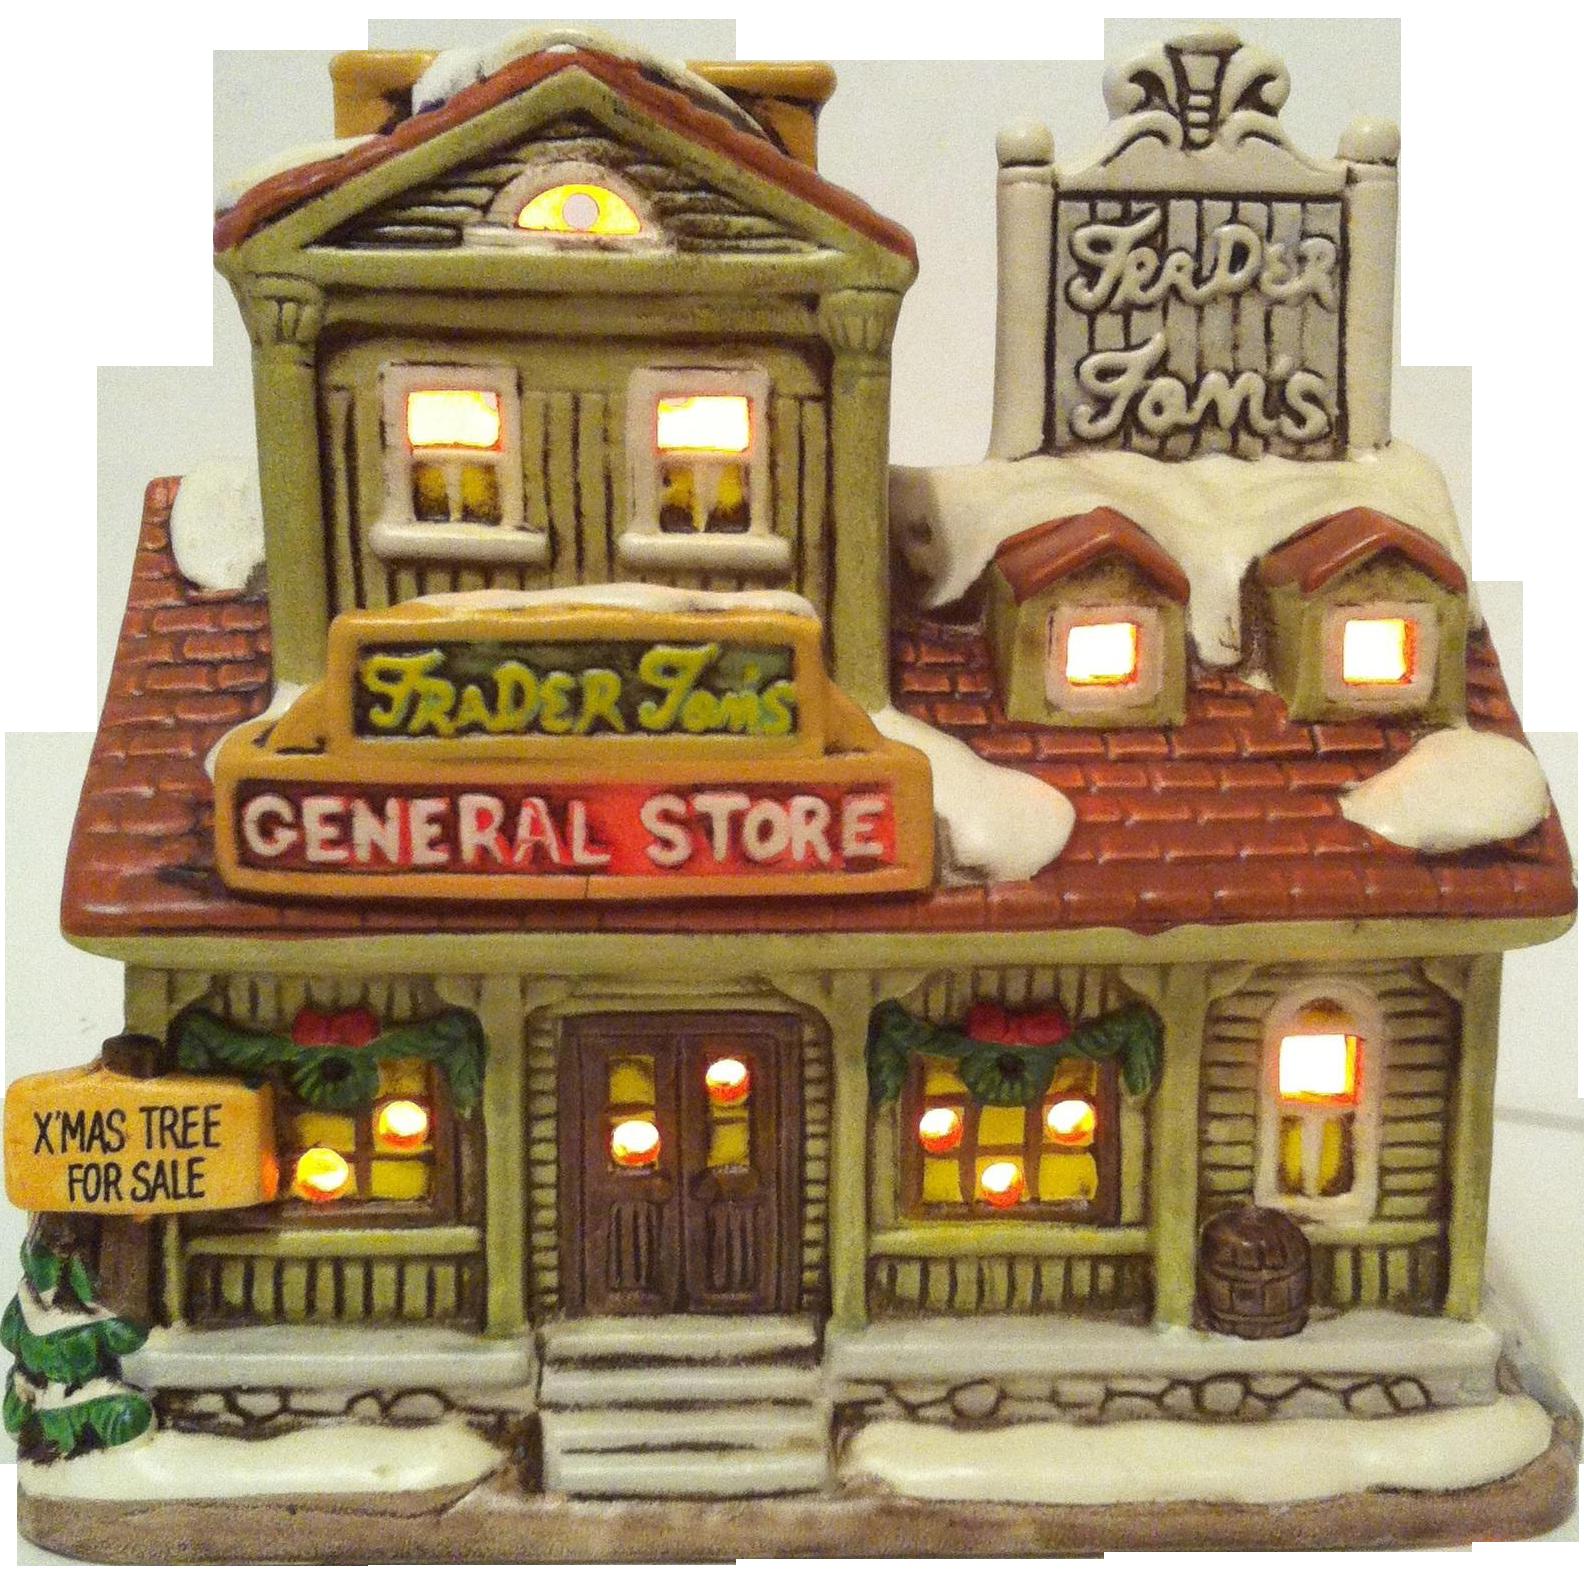 1987 Lefton Trader Tom's General Store ~ Colonial Village # 06336